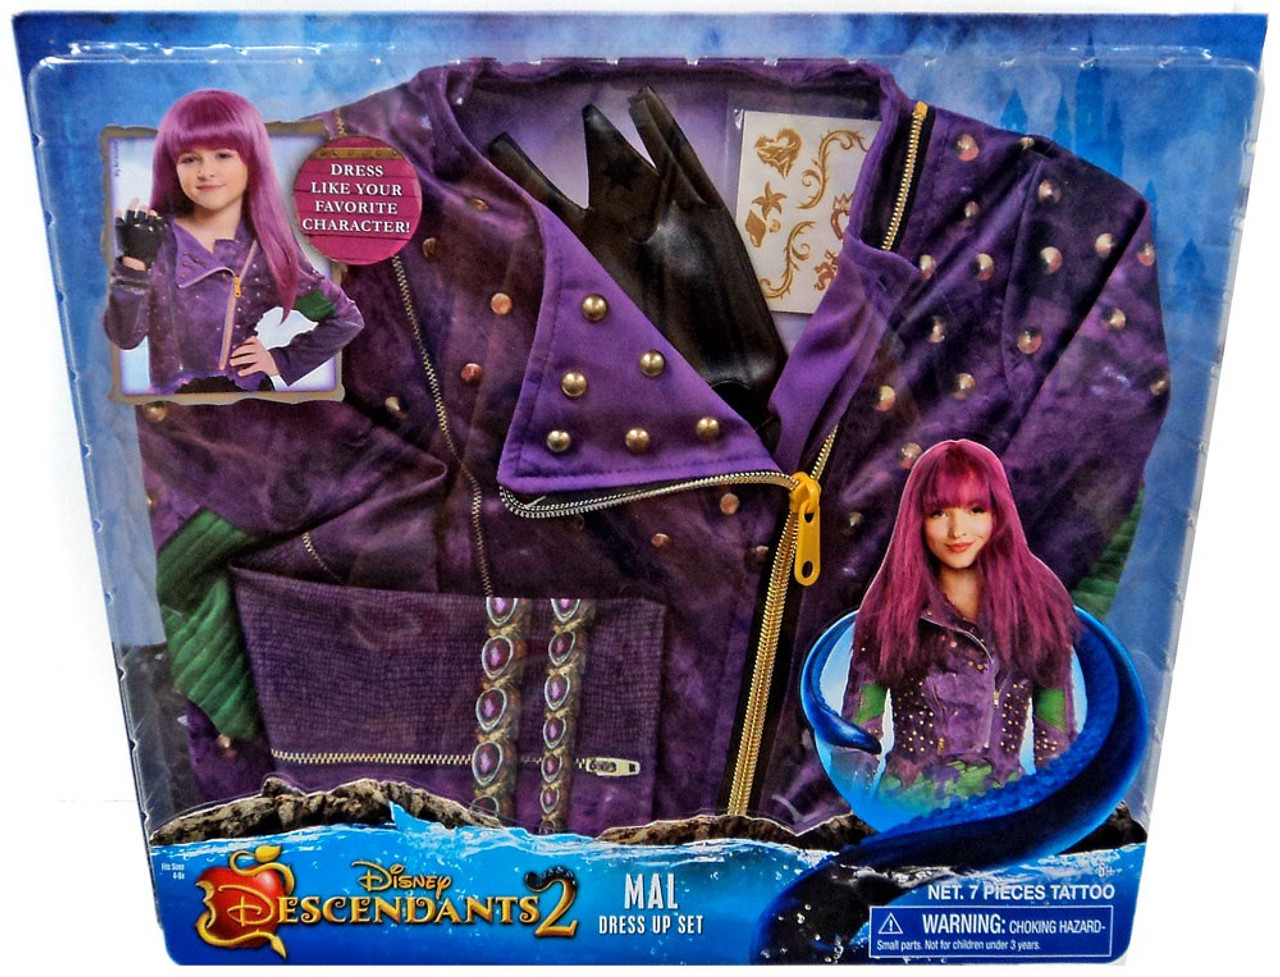 Disney Descendants Descendants 2 Mal Dress Up Kit Hasbro